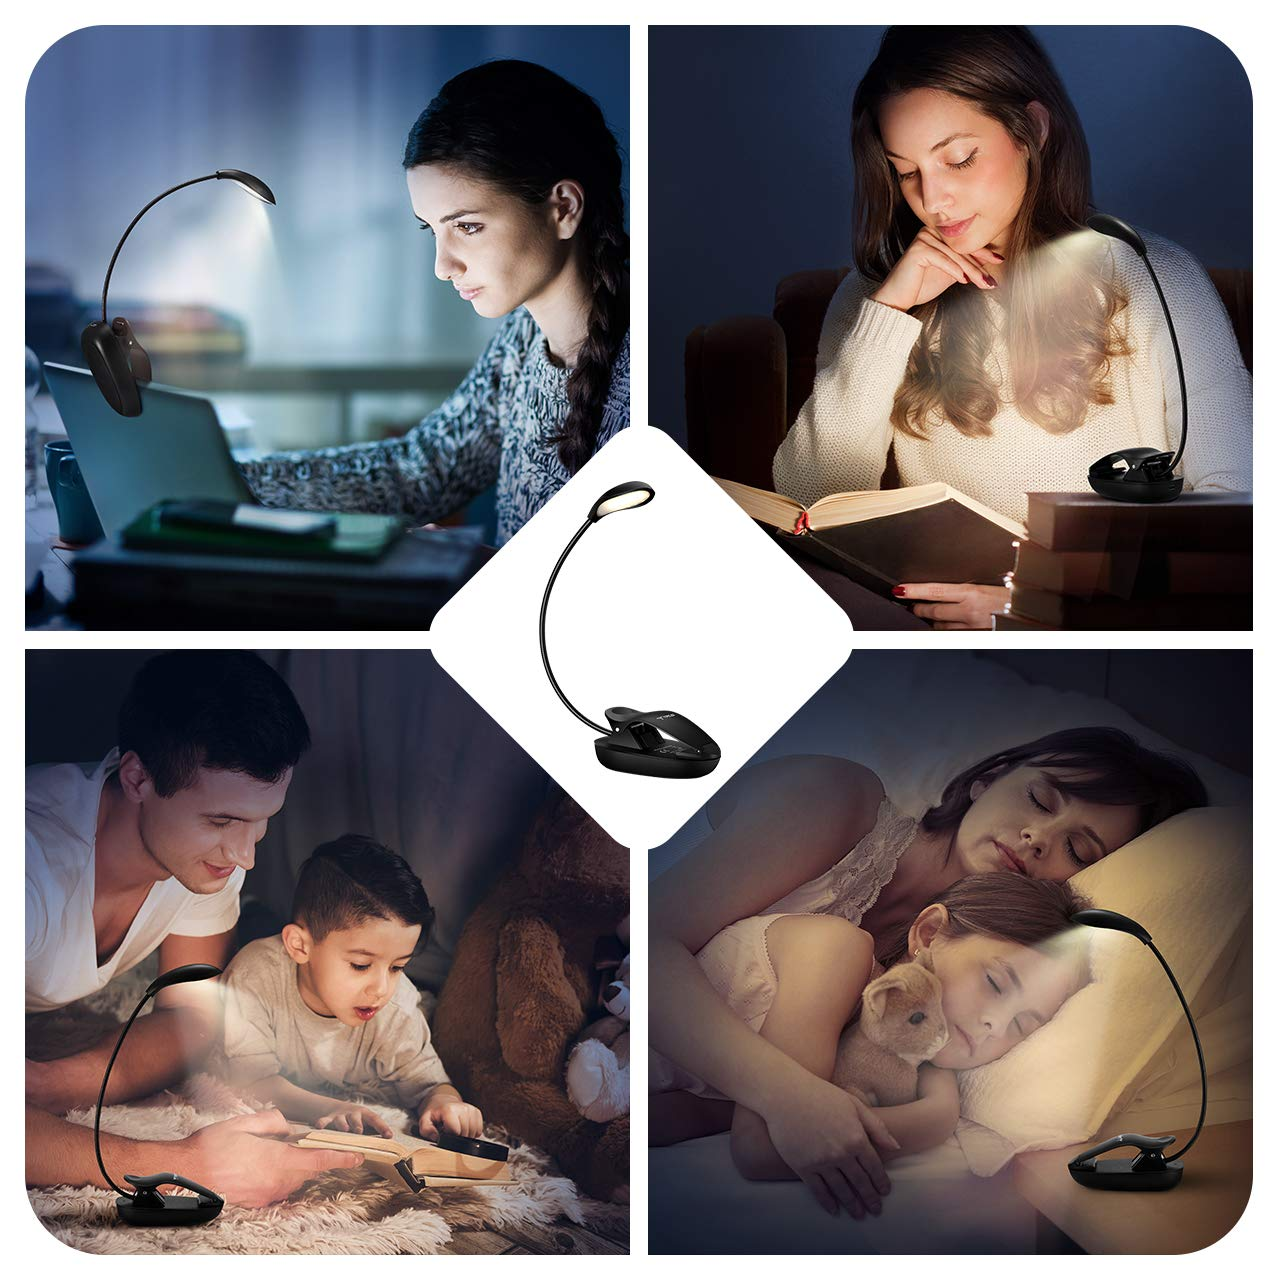 Flexo Pinza USB Cable de Carga Incluido Luz Port/átil Clip para Kindle,Lectores Noche Luz Lectura,TOPELEK Lampara de Lectura con 8 Luces LED 3 Niveles de Intensidad